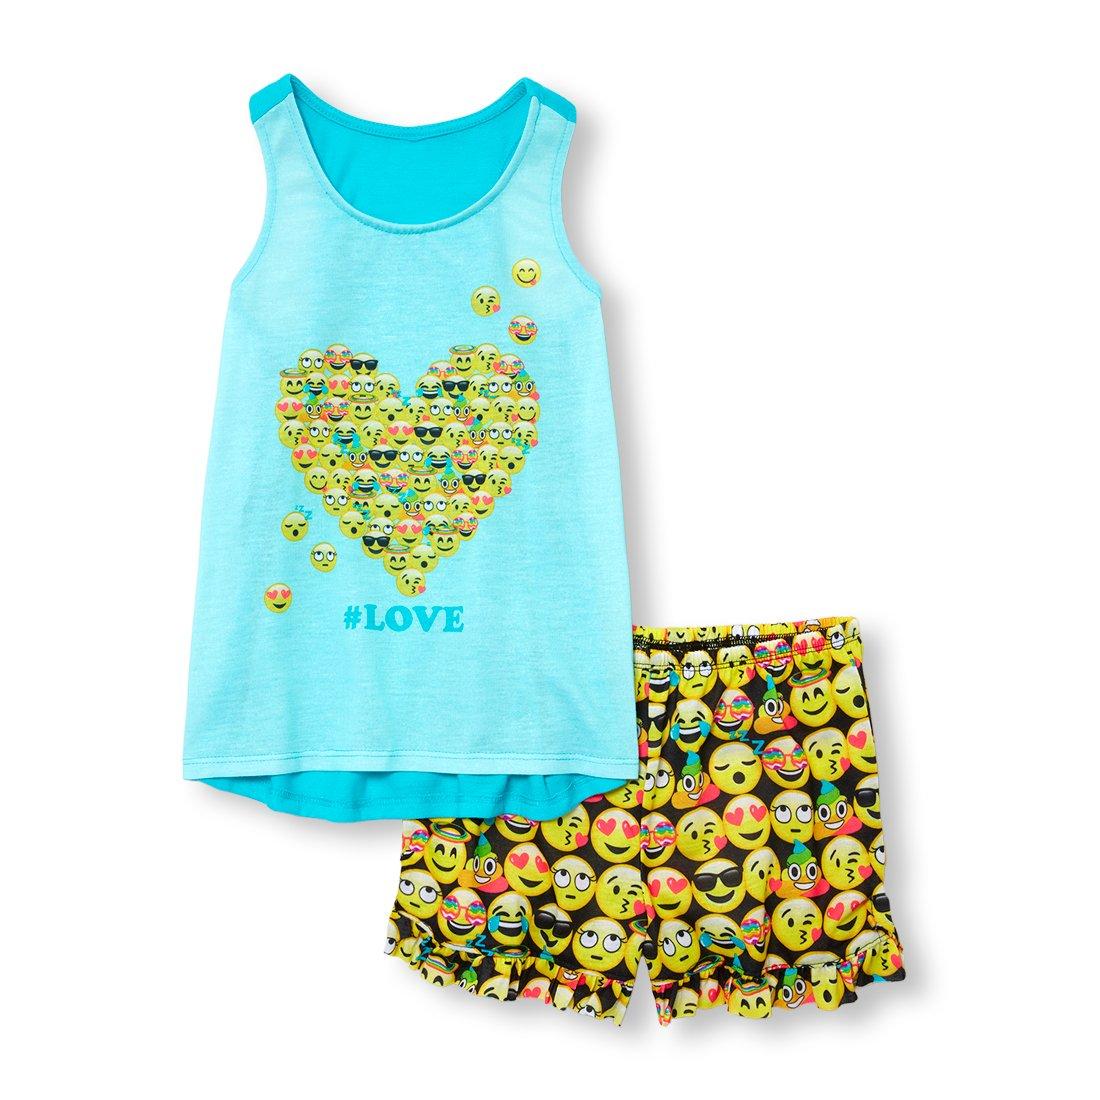 The Children's Place Big Girls' Top and Shorts Pajama Set, Softmarine, S (5/6)